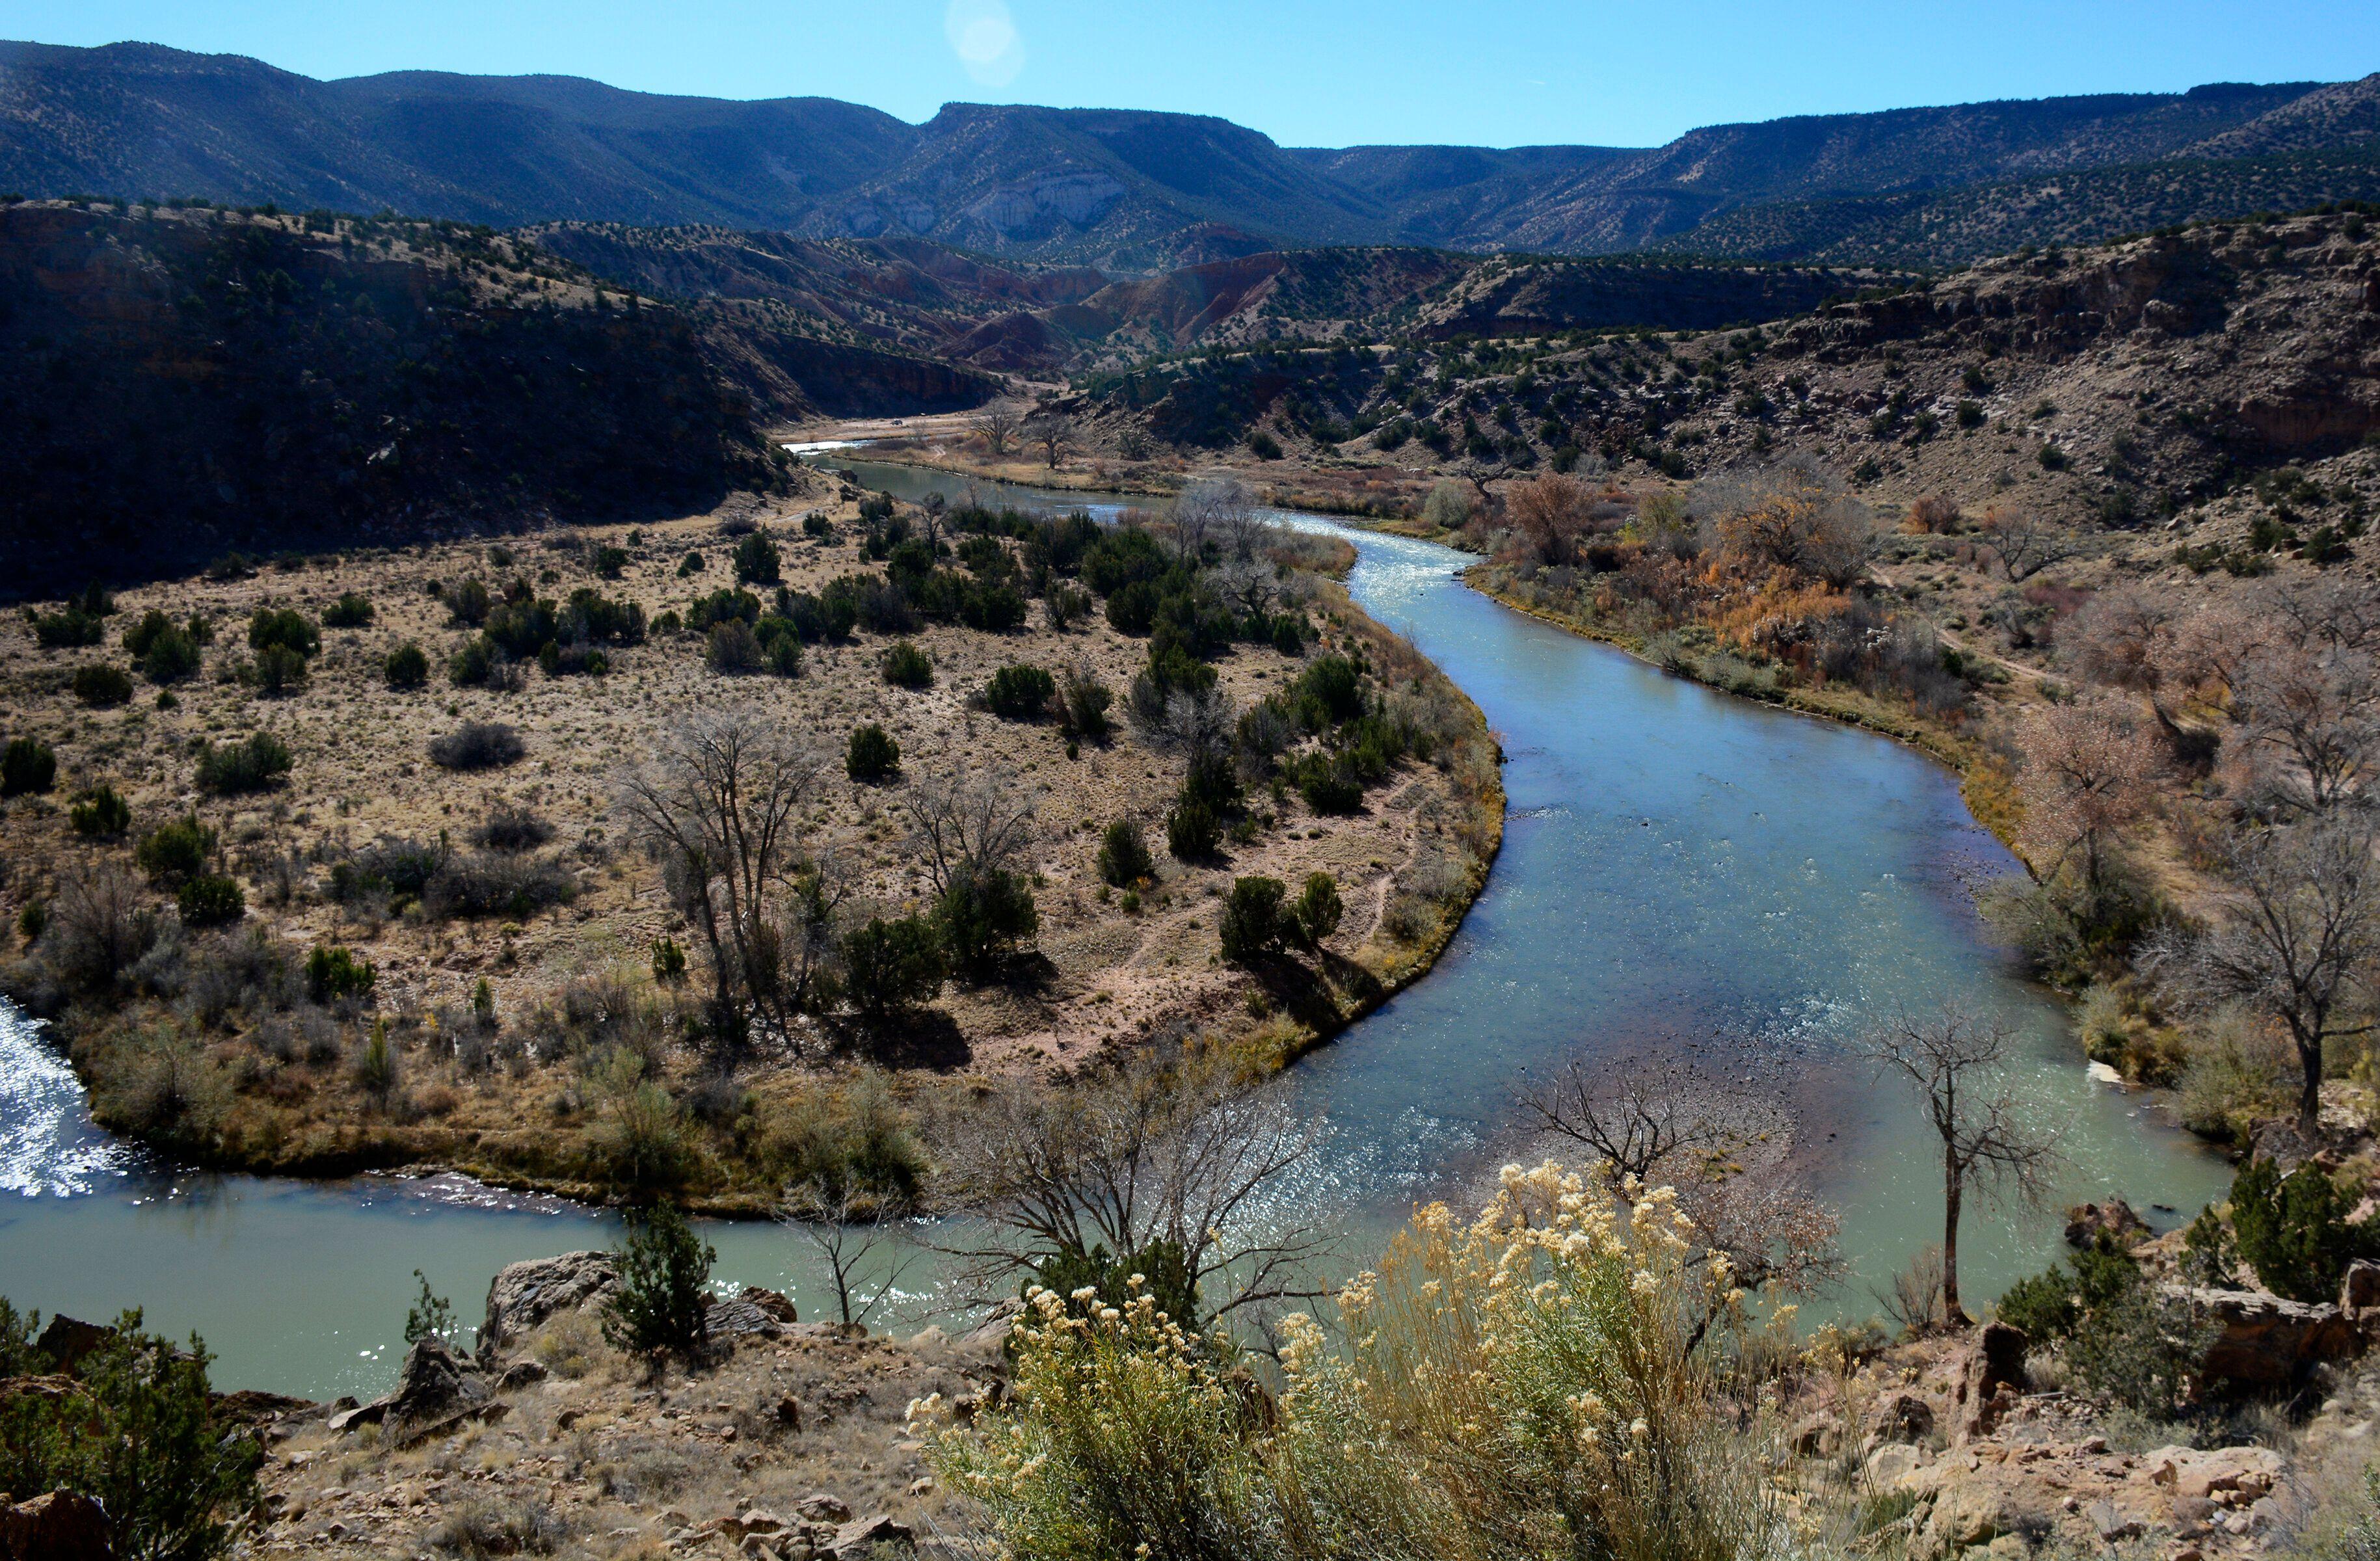 The Rio Chama originates in Colorado and feeds into the Rio Grande in New Mexico. New Mexico allowslandowners to stake